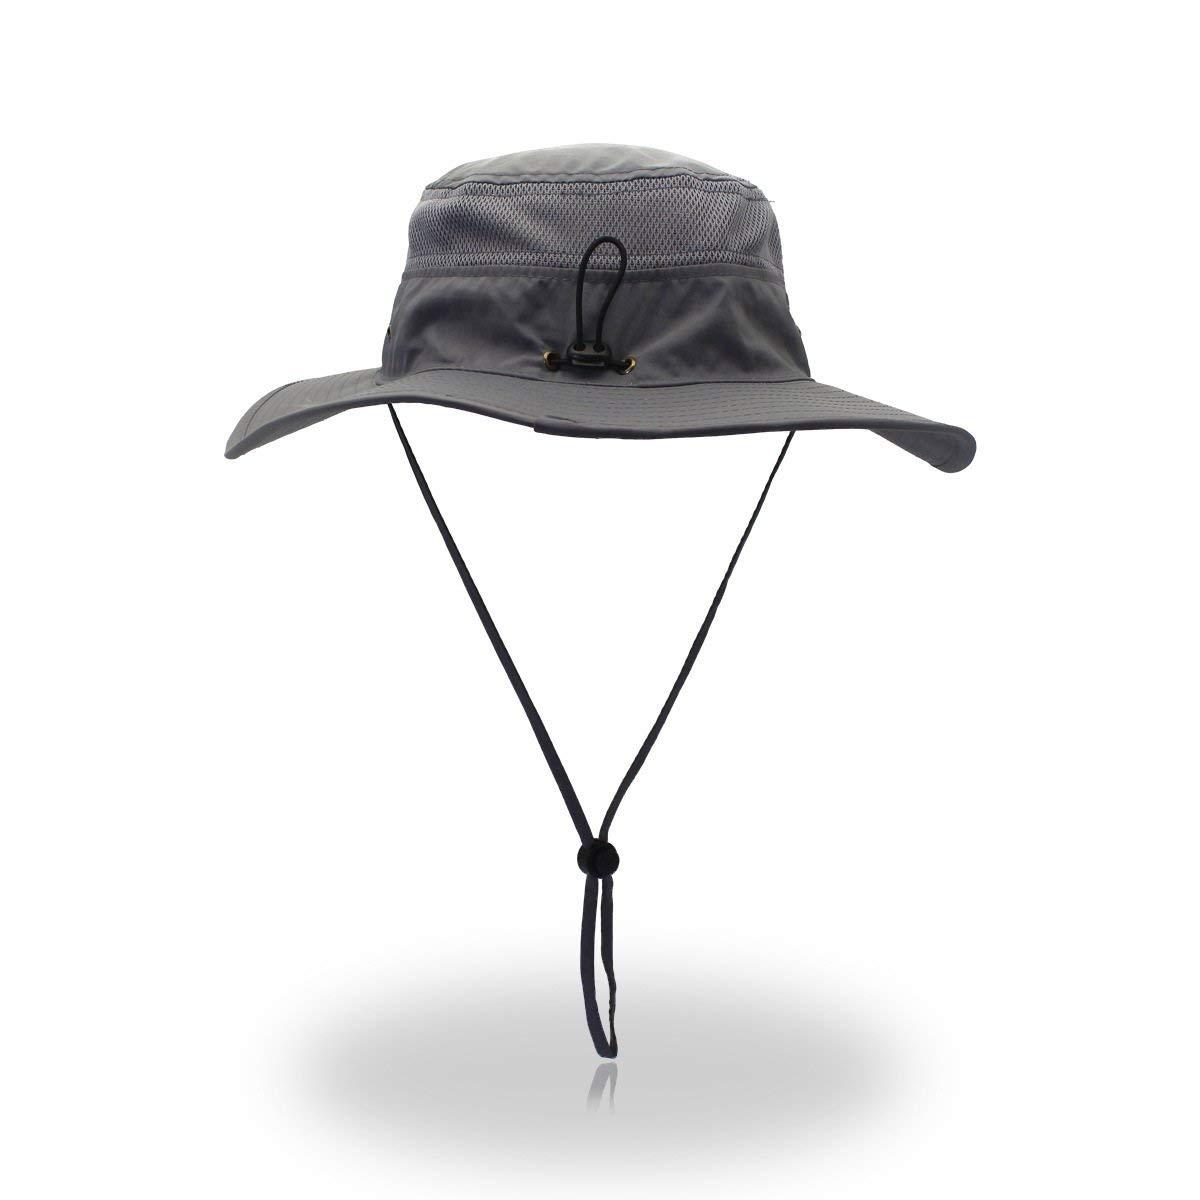 EasyOh Fishing Hat Outdoor UPF 50 Waterproof Boonie Hat Summer UV Protection Sun Caps for Men Women